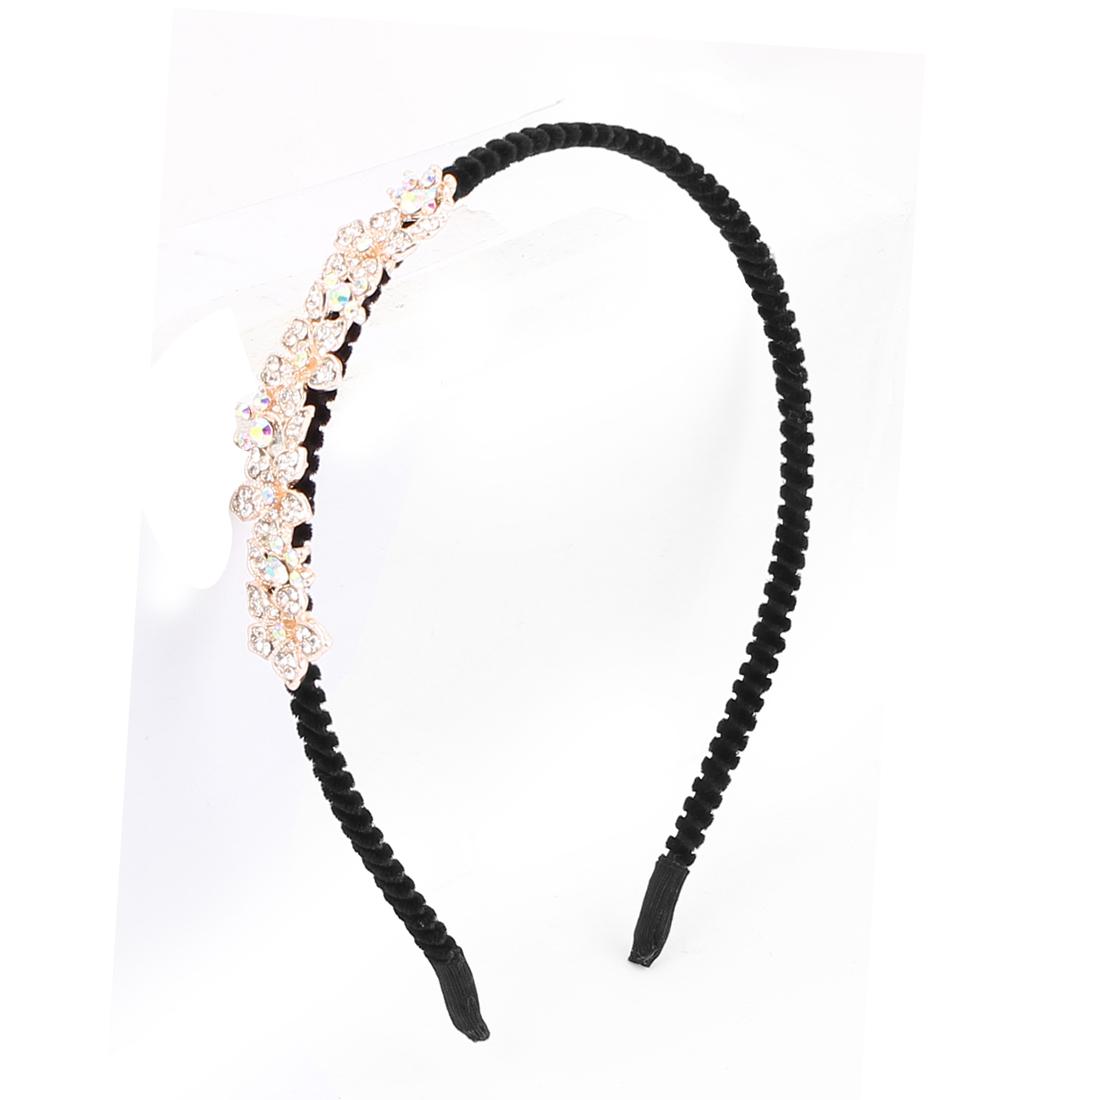 Lady Shiny Rhinestone Inlaid Flowers Shape Design Hair Hoop Hairband Headband Headdress Hairpin Black Copper Tone